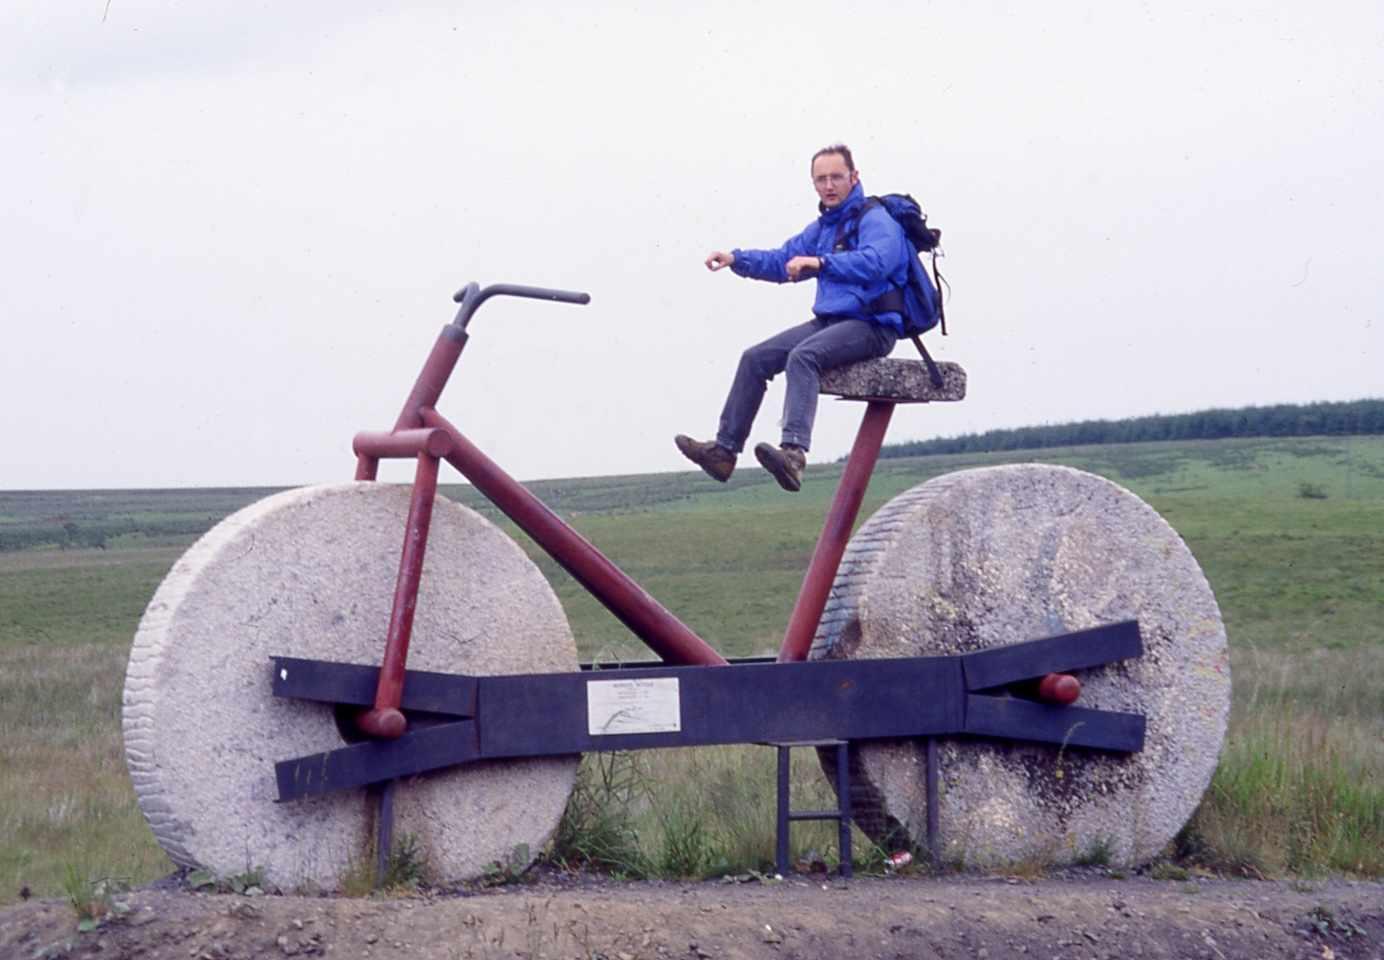 Bedrock Bike sculpture on the railpath